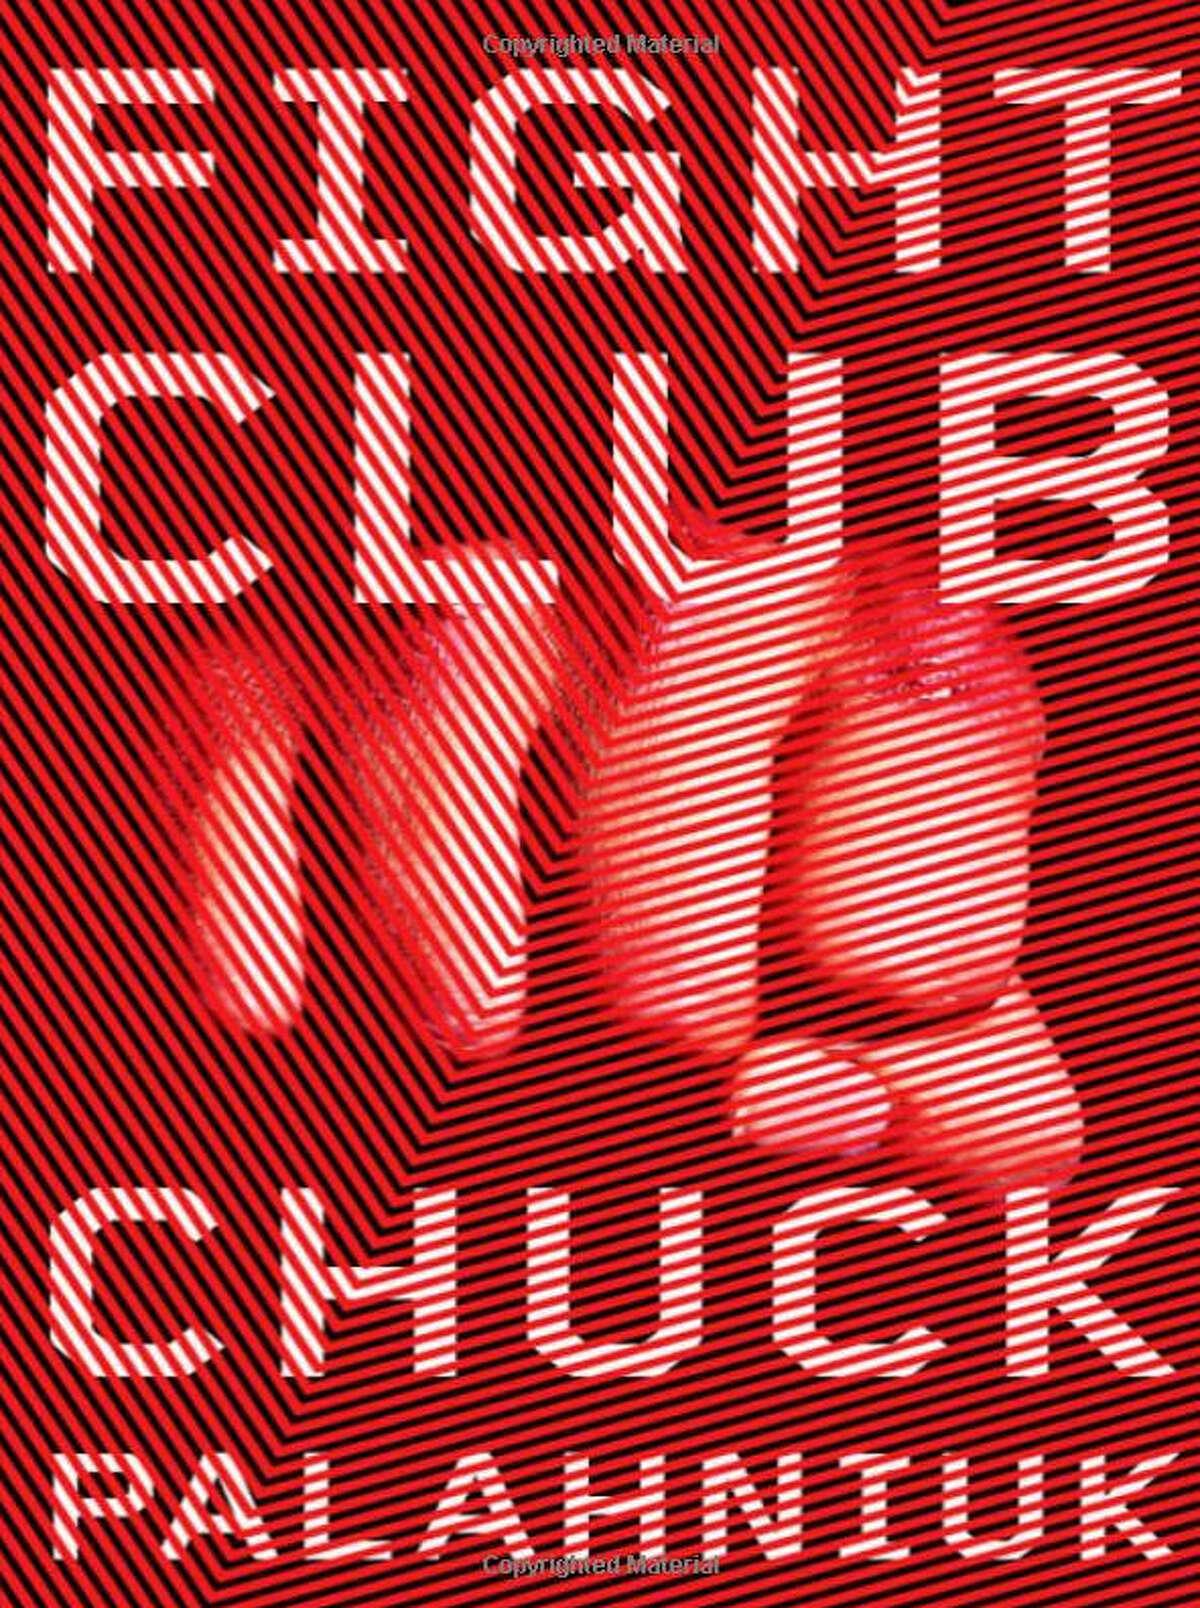 """Fight Club"" ByChuck Palahniuk"